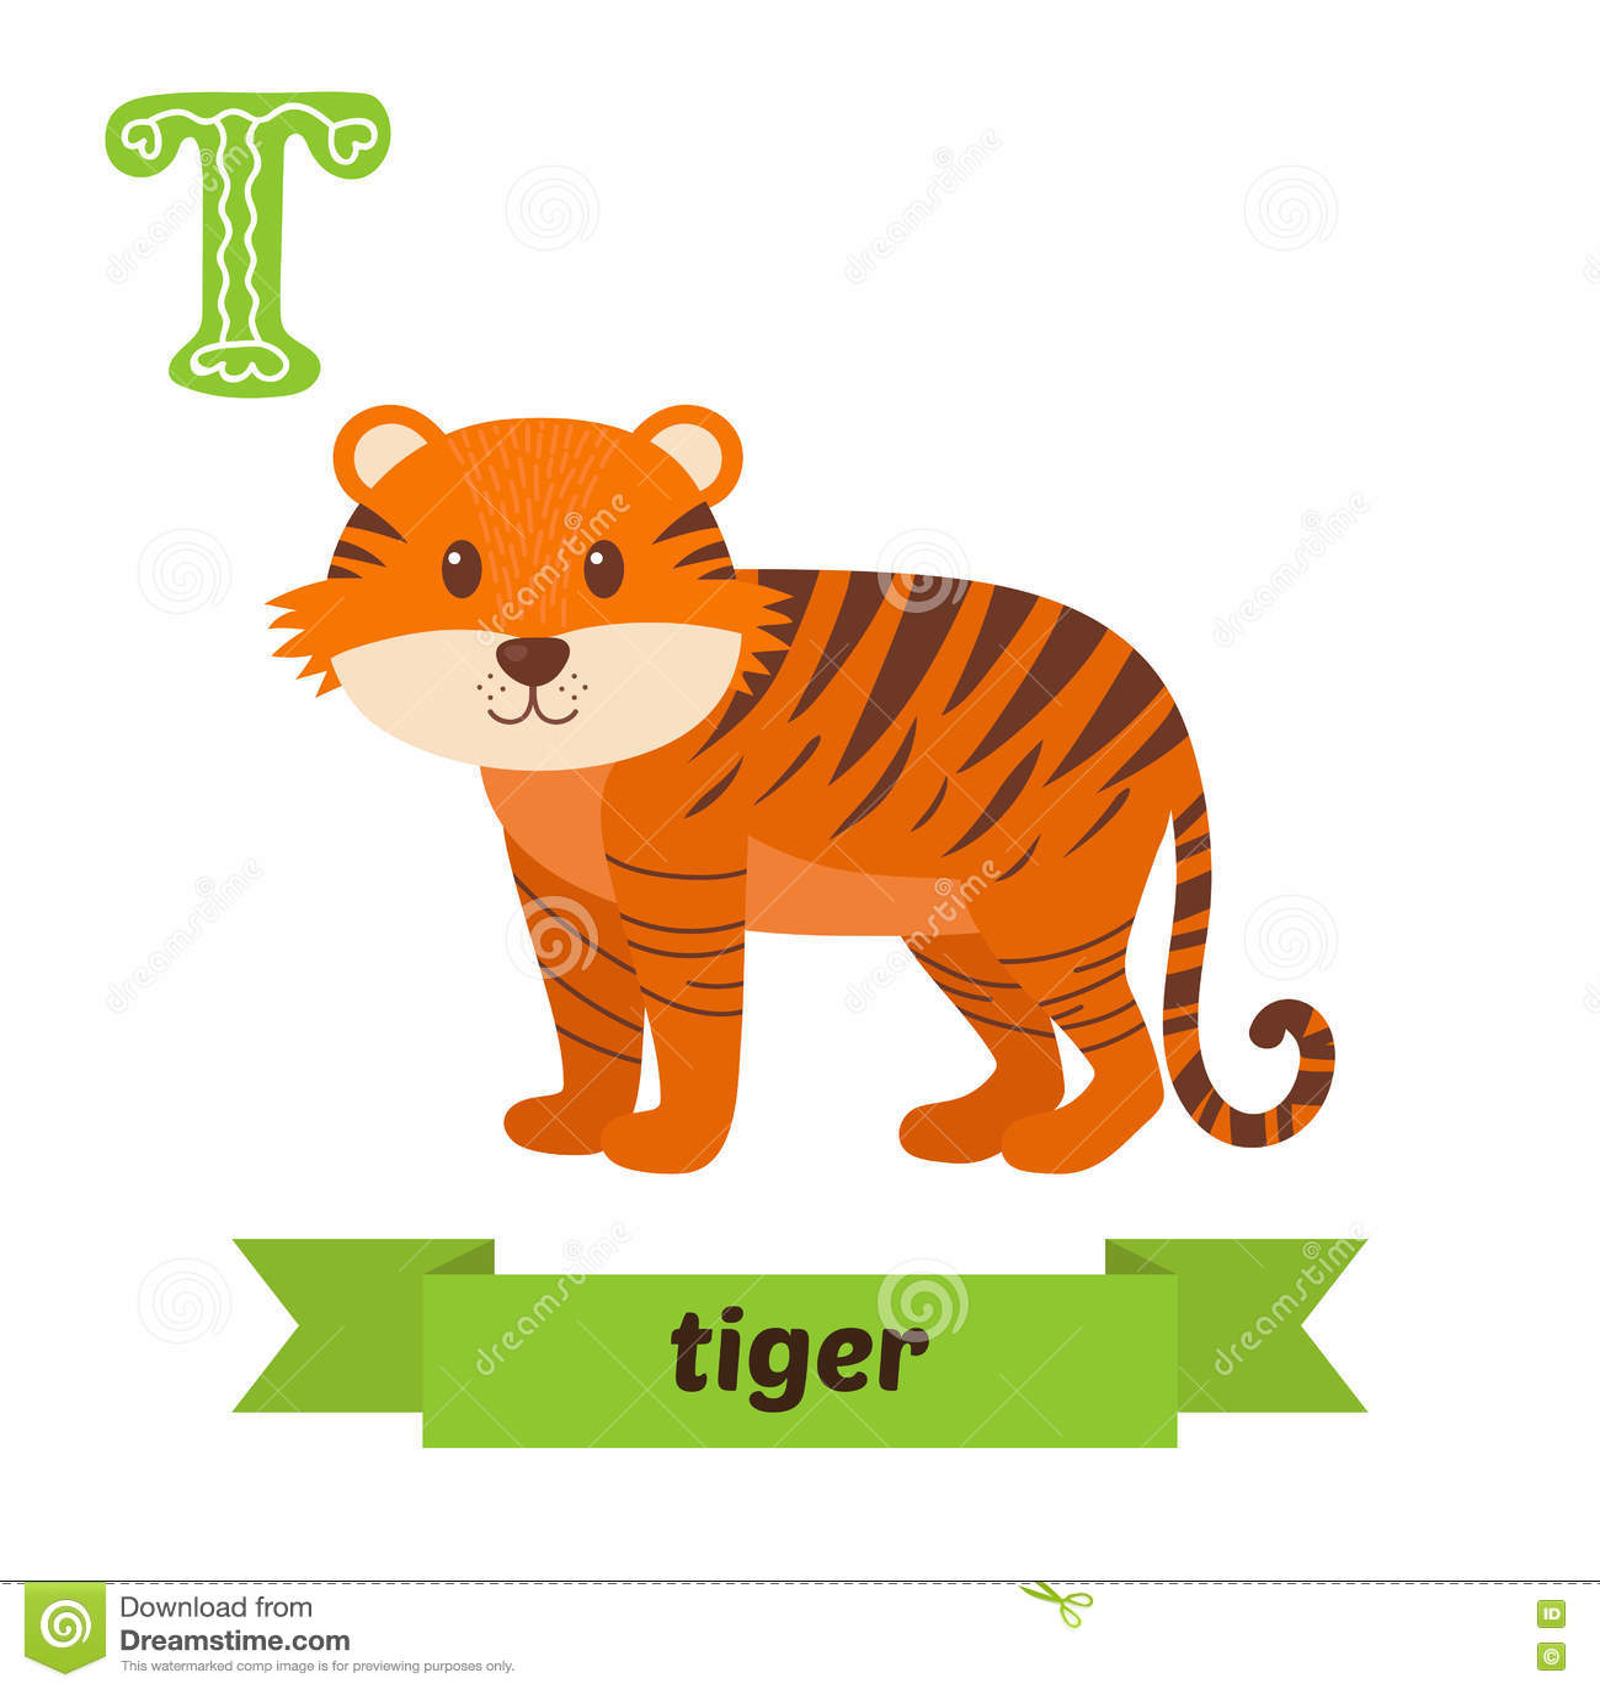 Tiger T Letter Cute Children Animal Alphabet In Vector